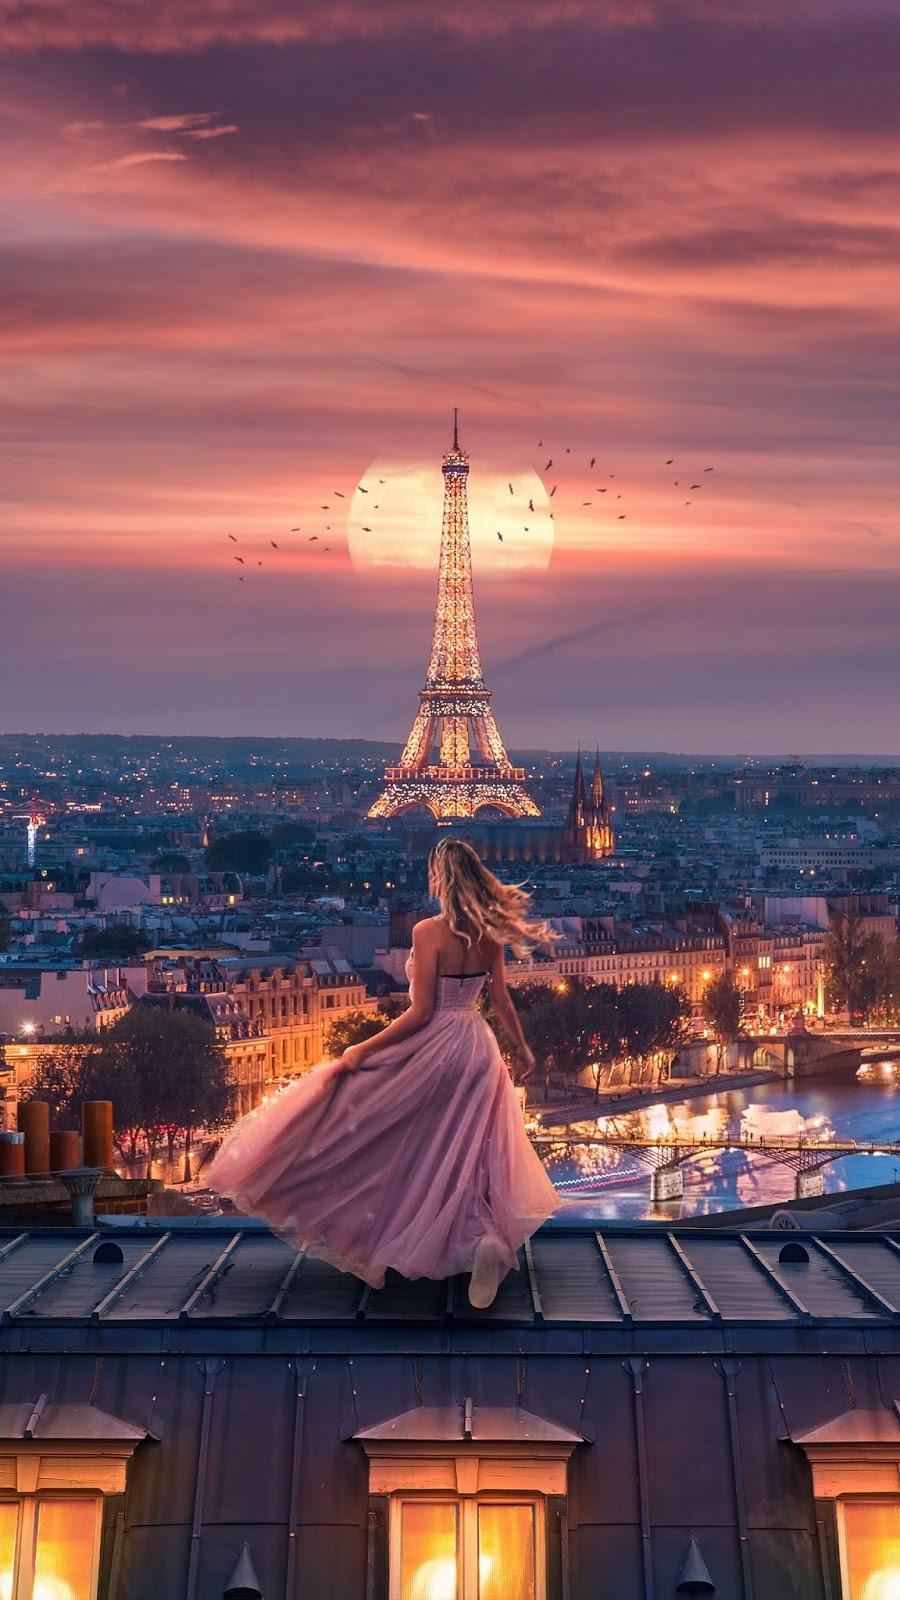 Moonlight over paris mobile wallpaper